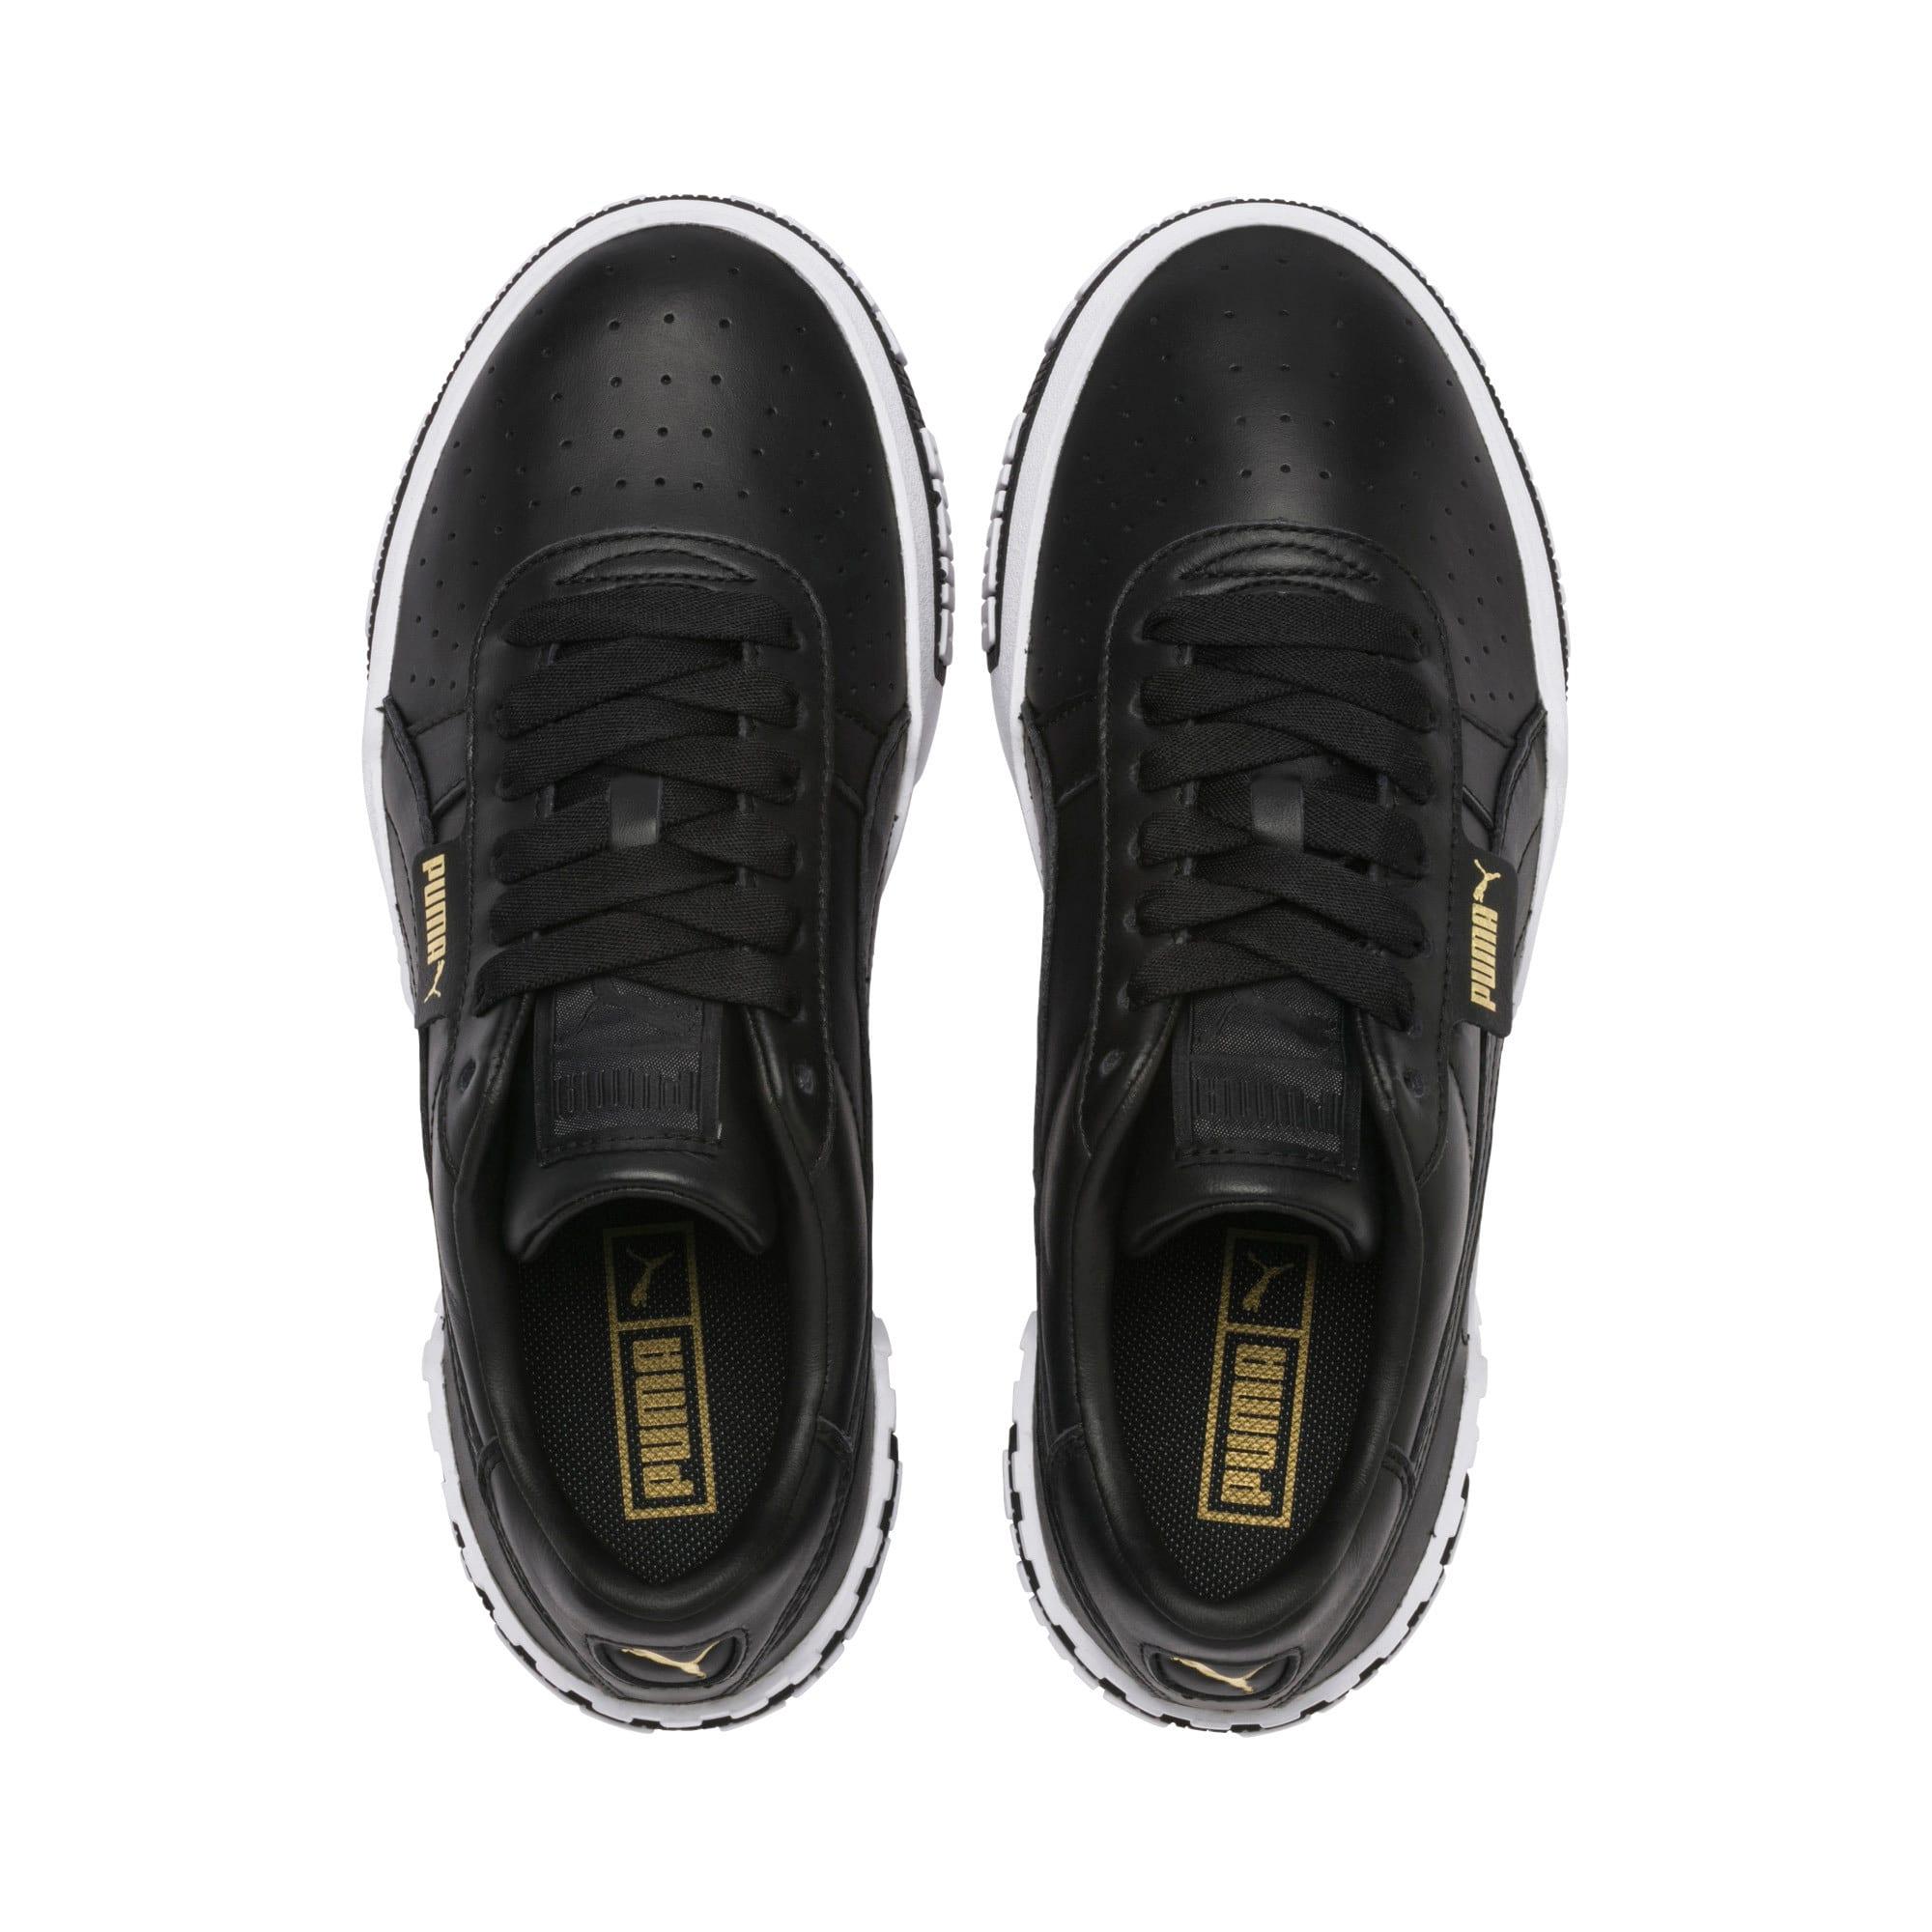 Thumbnail 8 of Cali Bold Women's Sneakers, Puma Black-Metallic Gold, medium